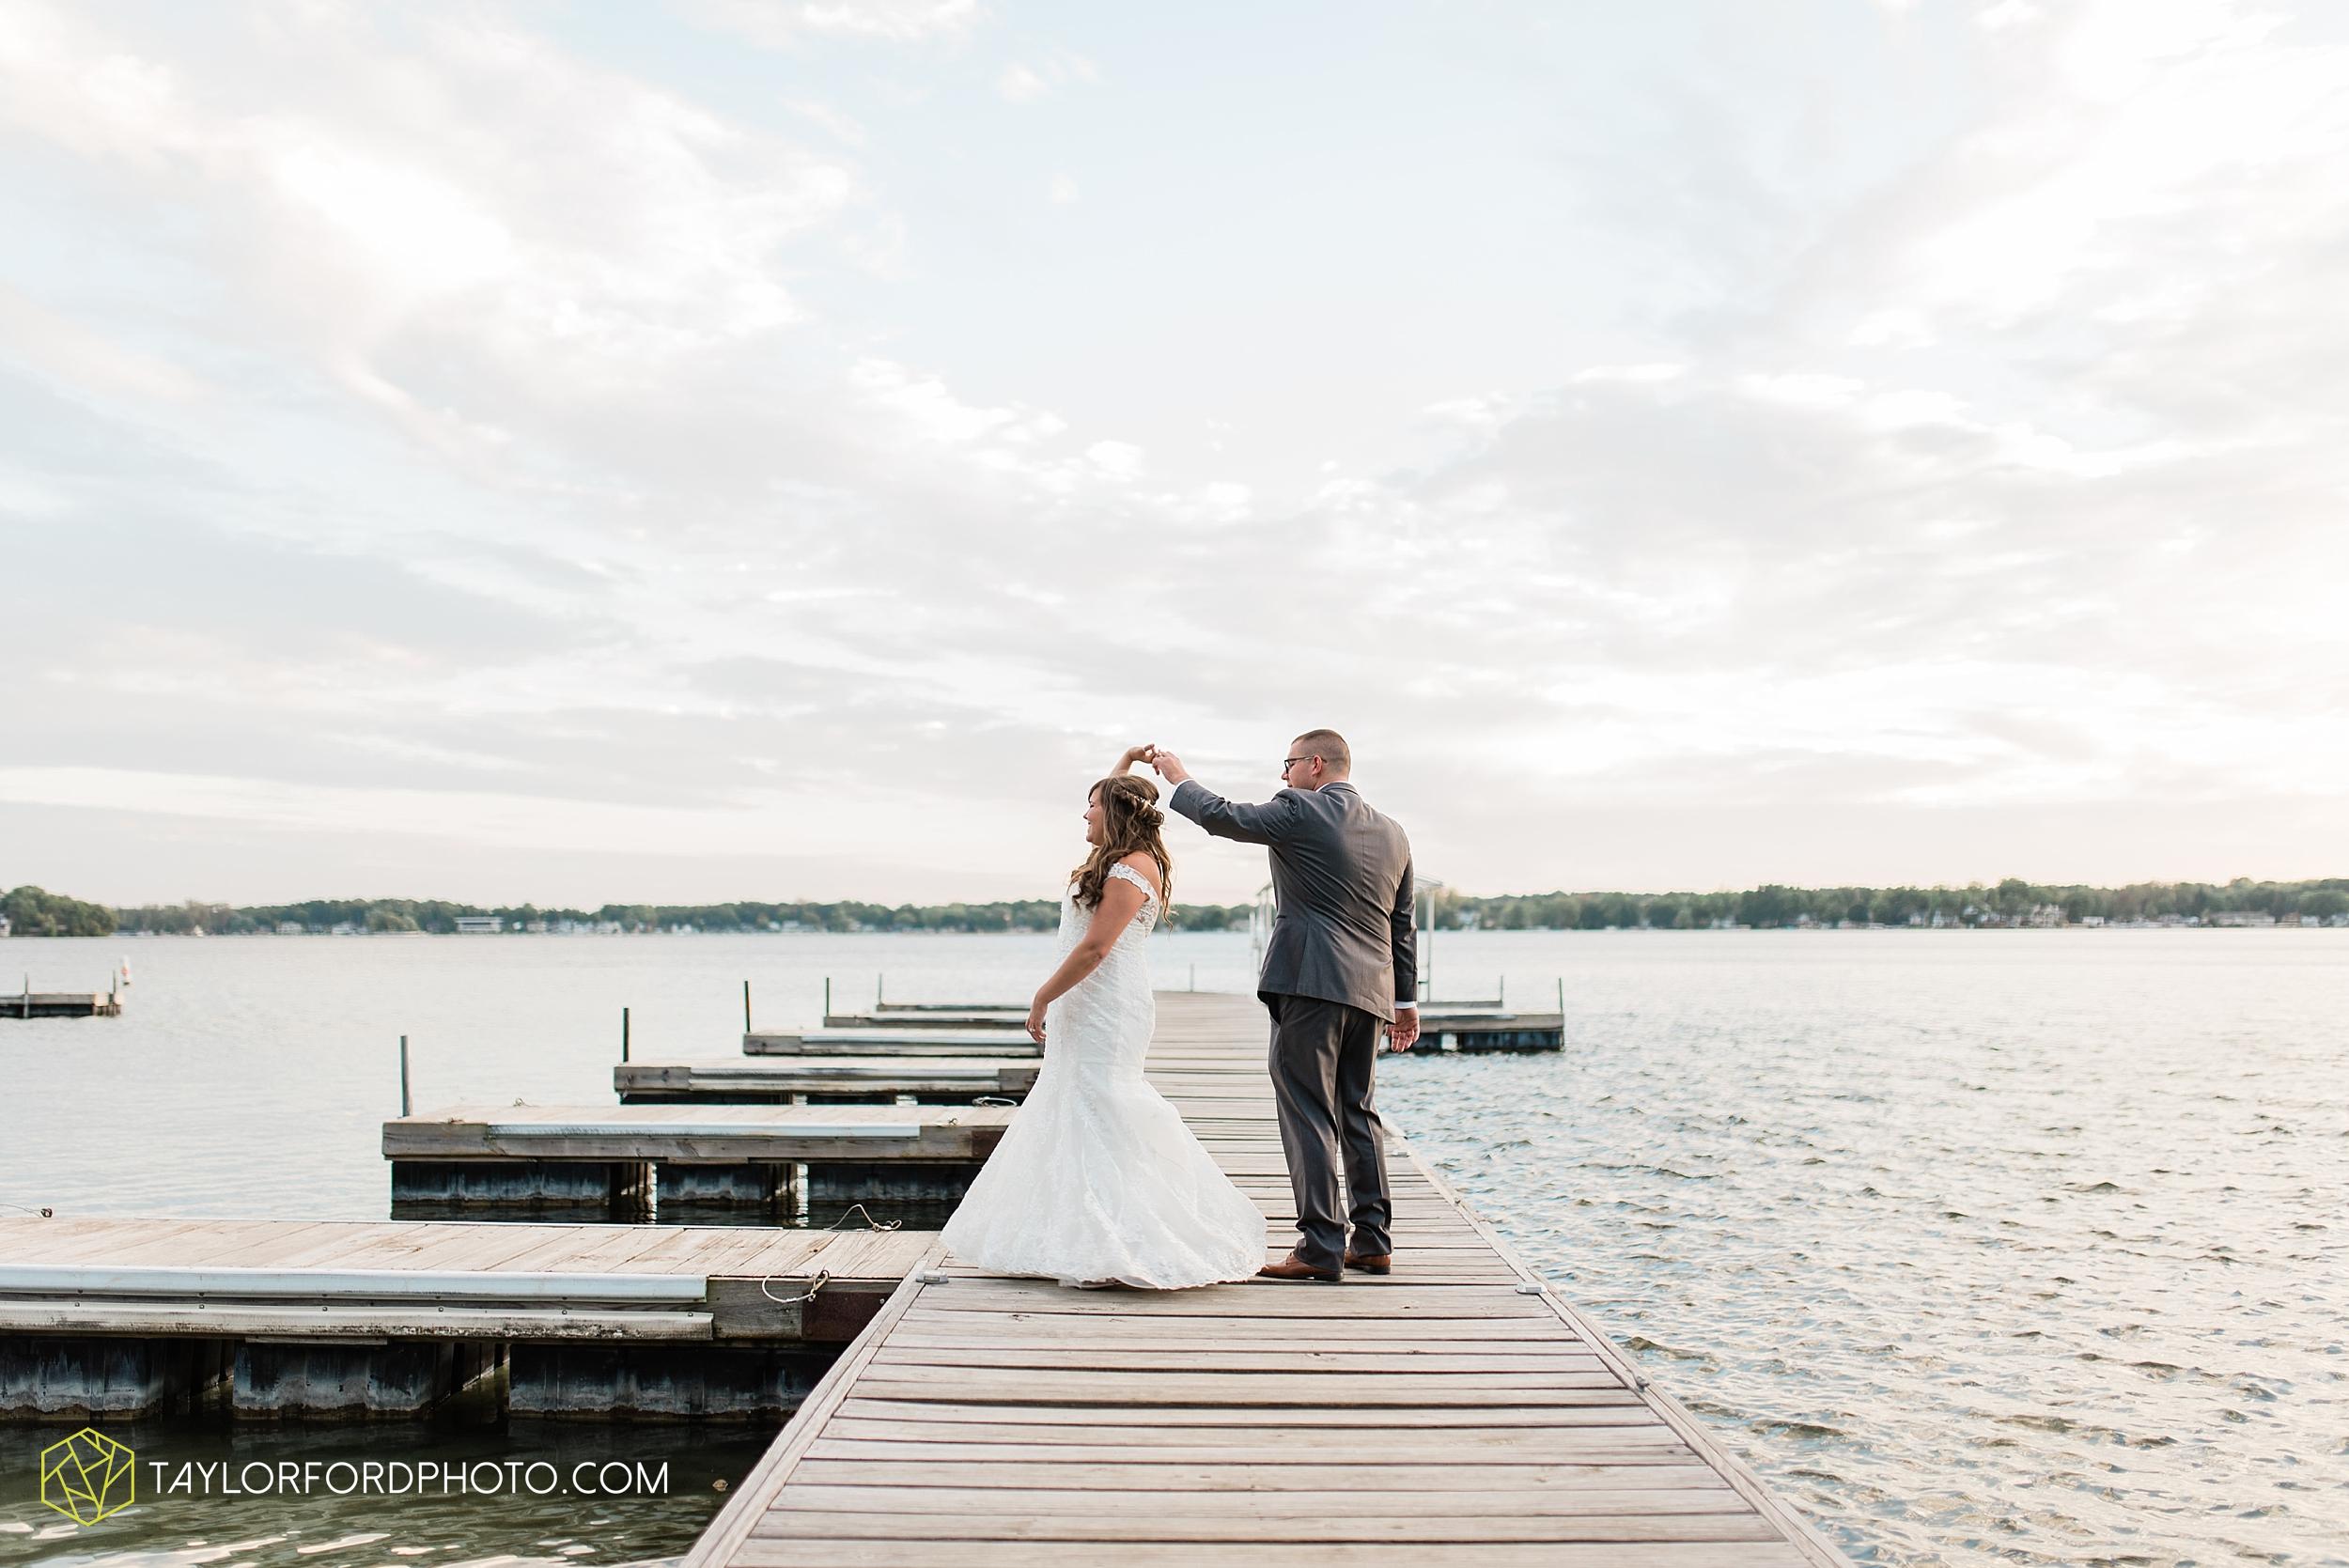 brook-loren-pokagon-state-park-angola-indiana-potowatomi-inn-wedding-fall-lake-james-photographer-taylor-ford-photography_0555.jpg